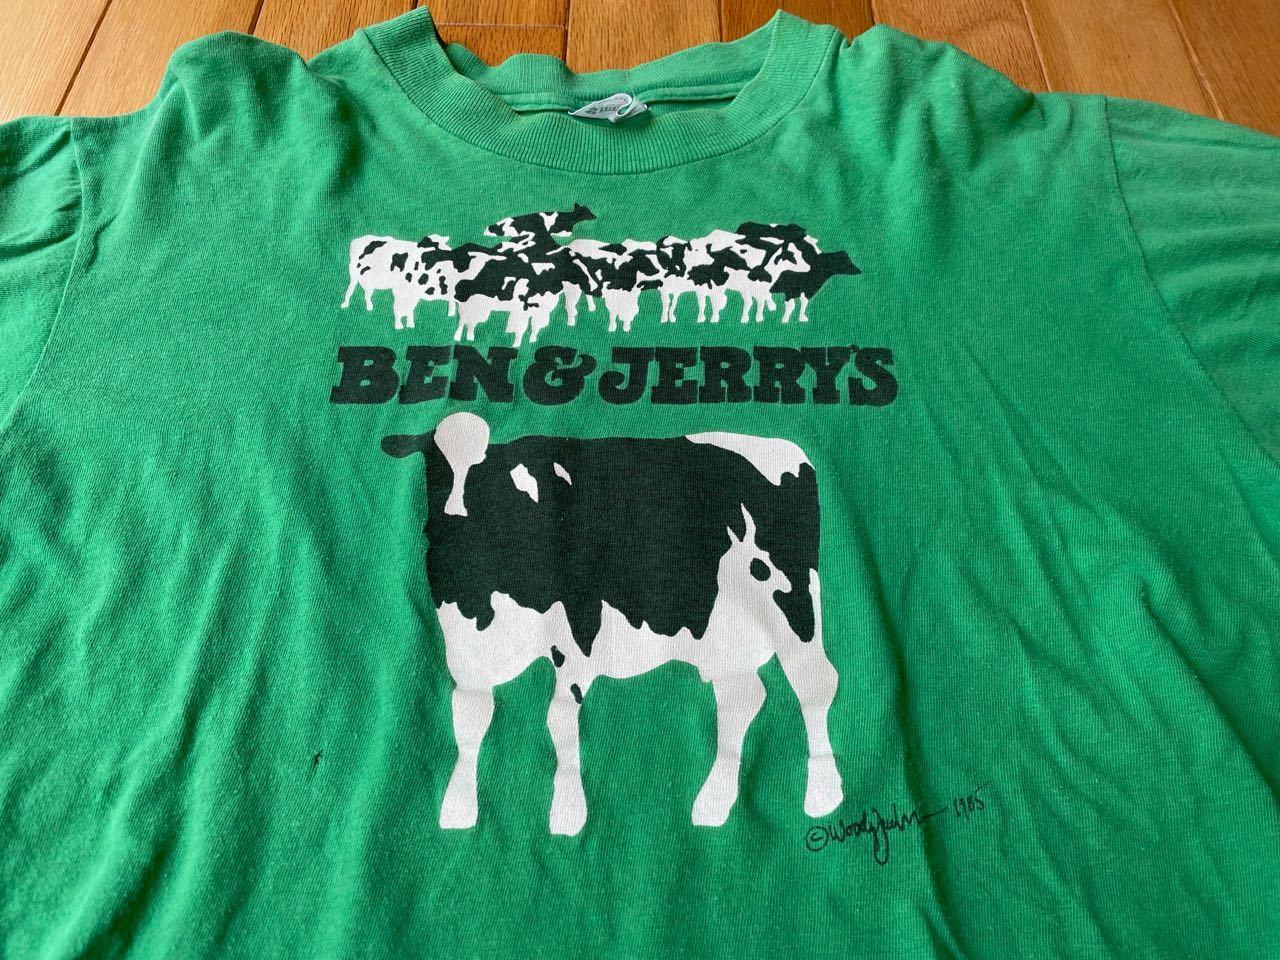 7月22日(木)入荷! 80s  BEN&JERRY\'S ICE CREAM Tシャツ!_c0144020_20334276.jpg